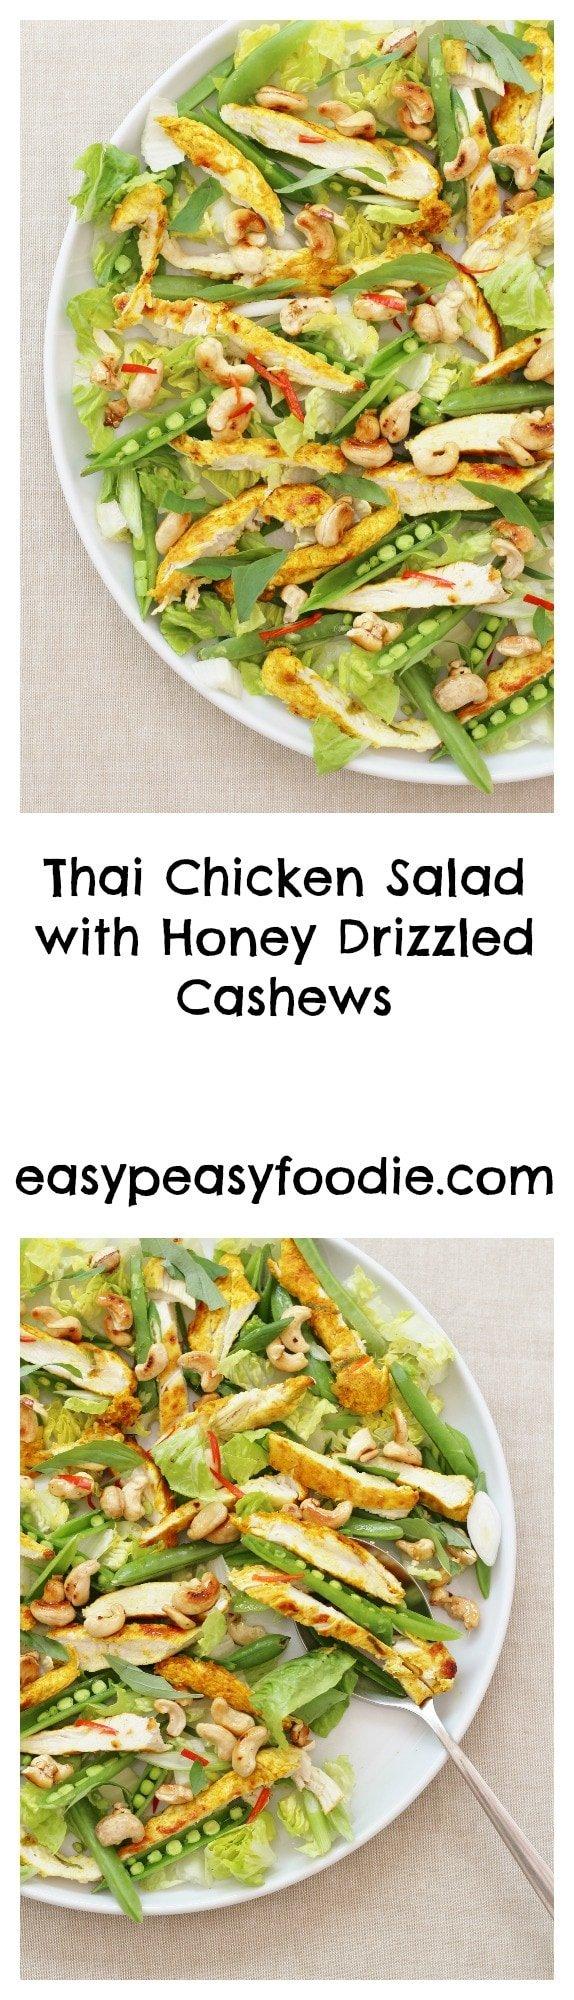 Thai Chicken Salad with Honey Drizzled Cashews